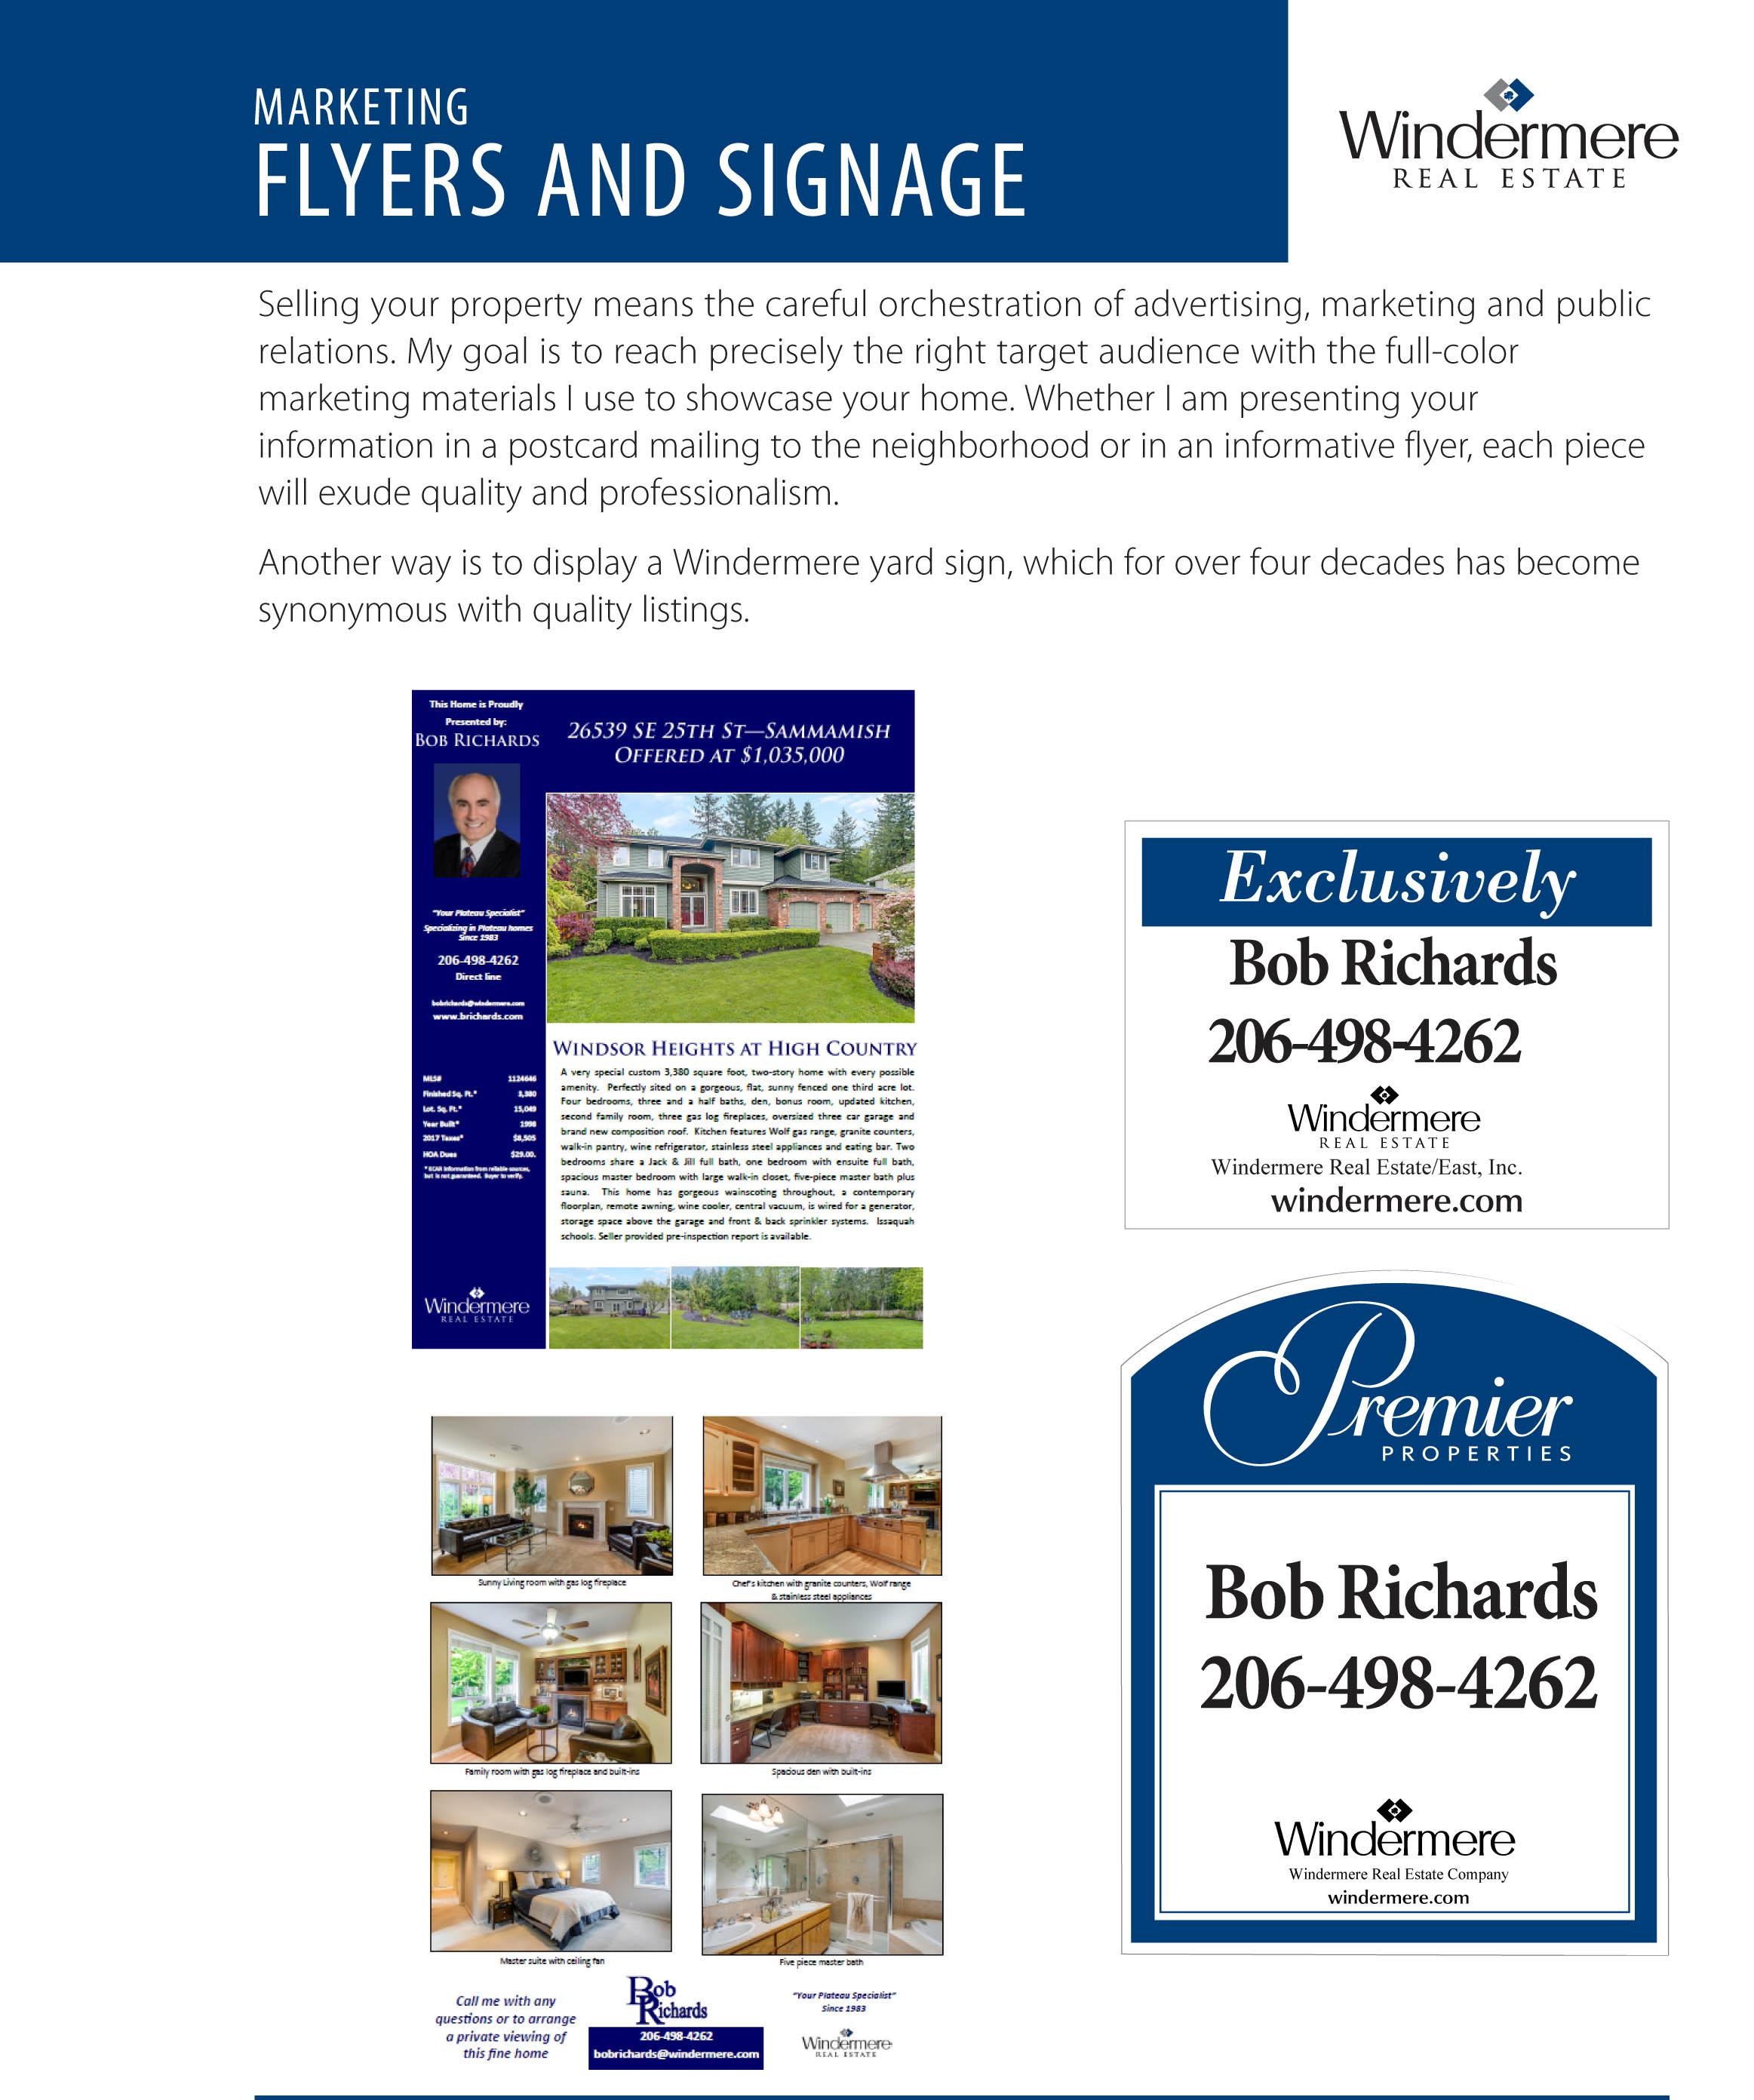 Neighborhood Issaquah Sammamish Top #1 real estate agent broker Bob Richards testimonials Klahanie Issaquah Top #1 real estate agent testimonials